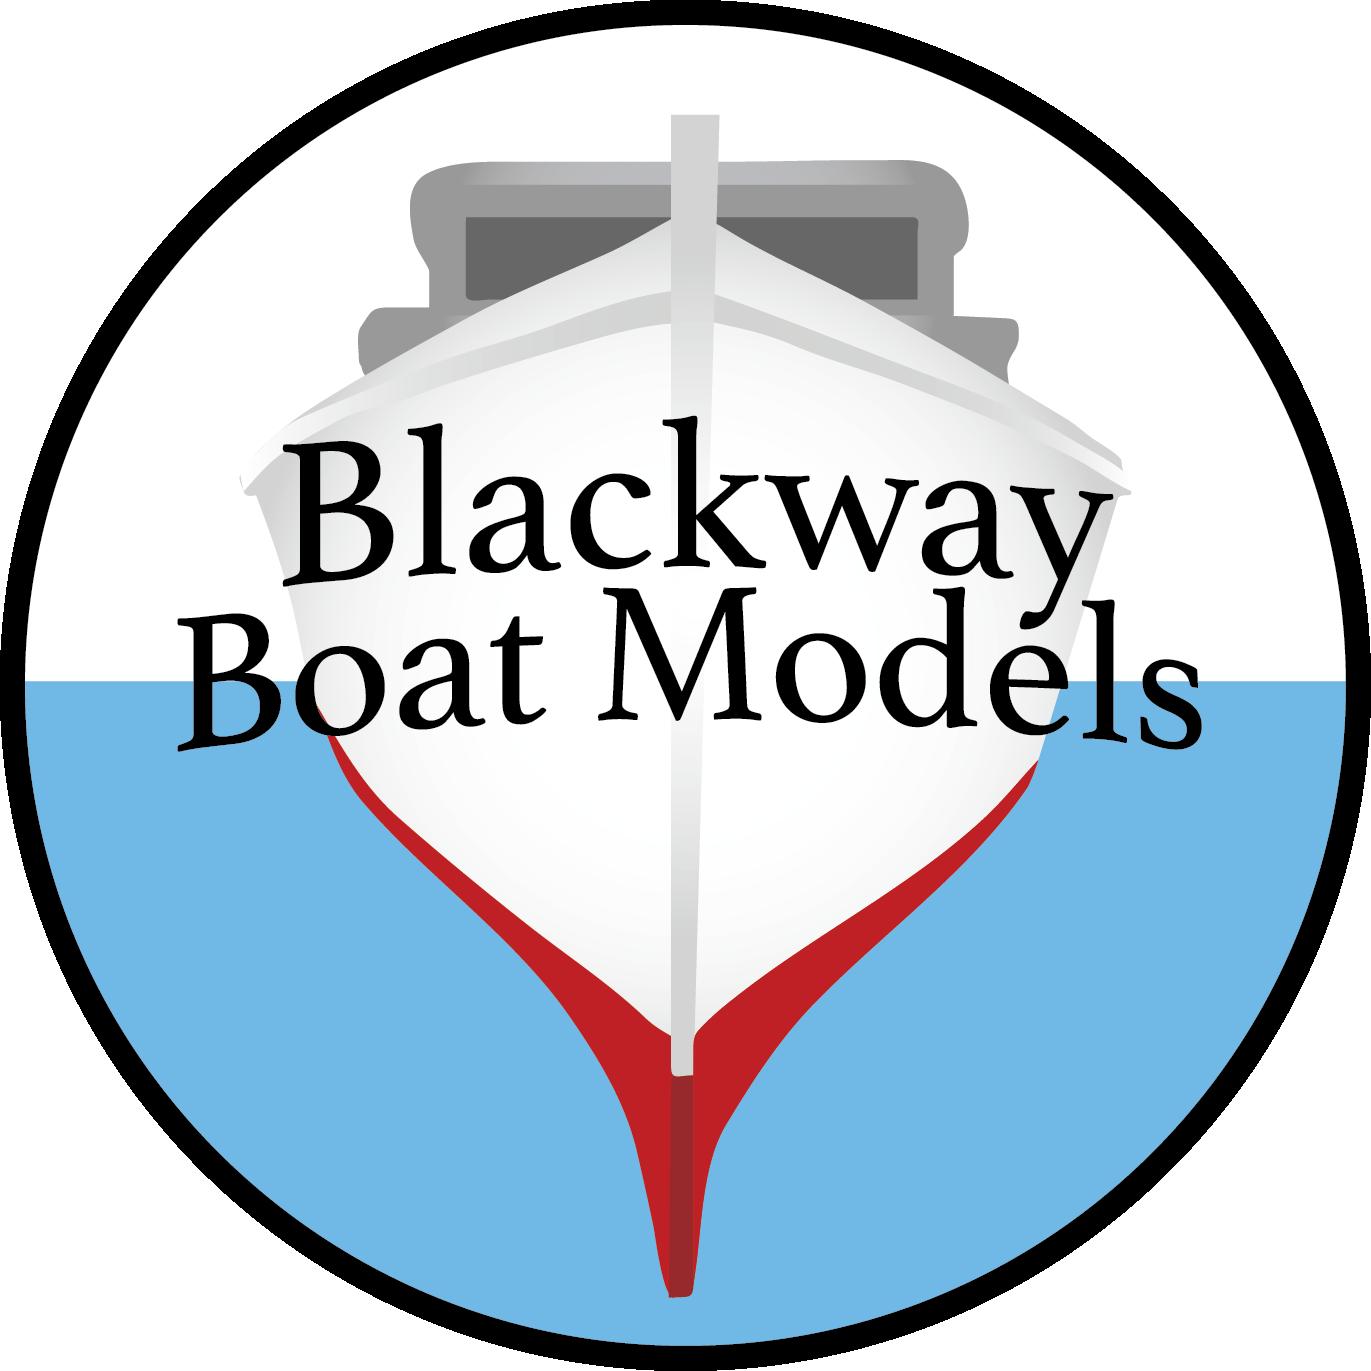 Blackway Boat Models Logo